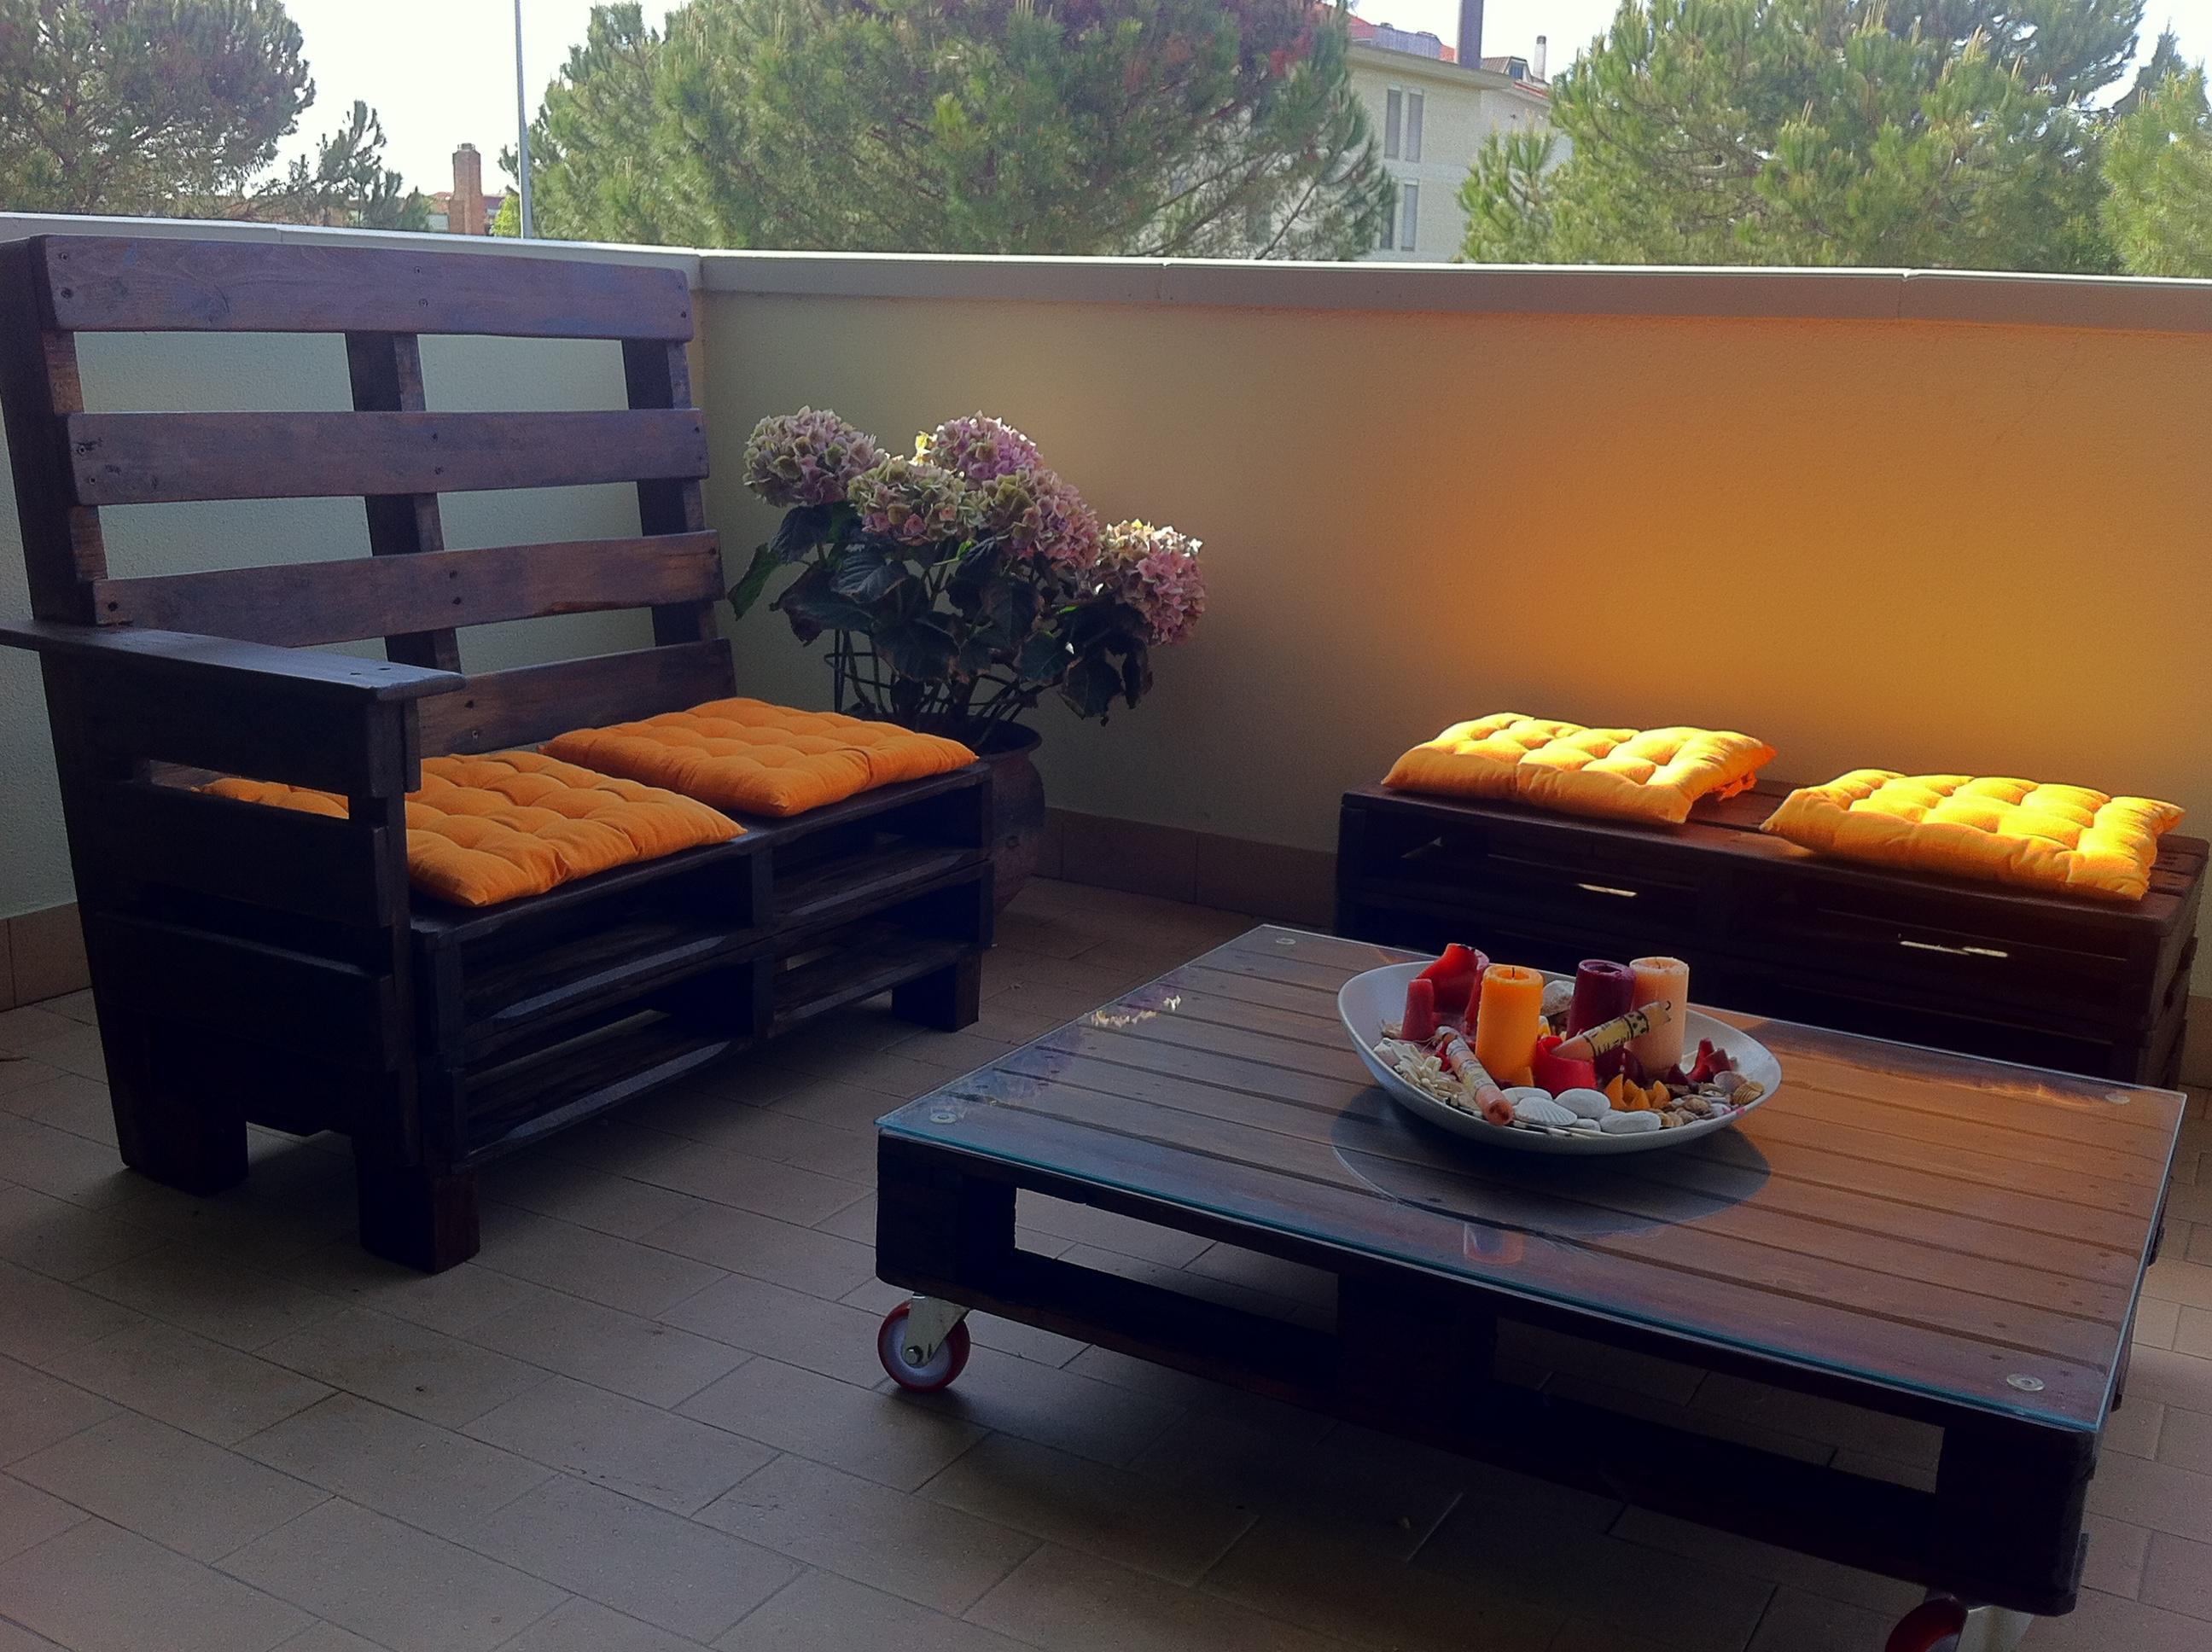 Riciclo bancali giardino qx19 regardsdefemmes for Pallet arredo giardino